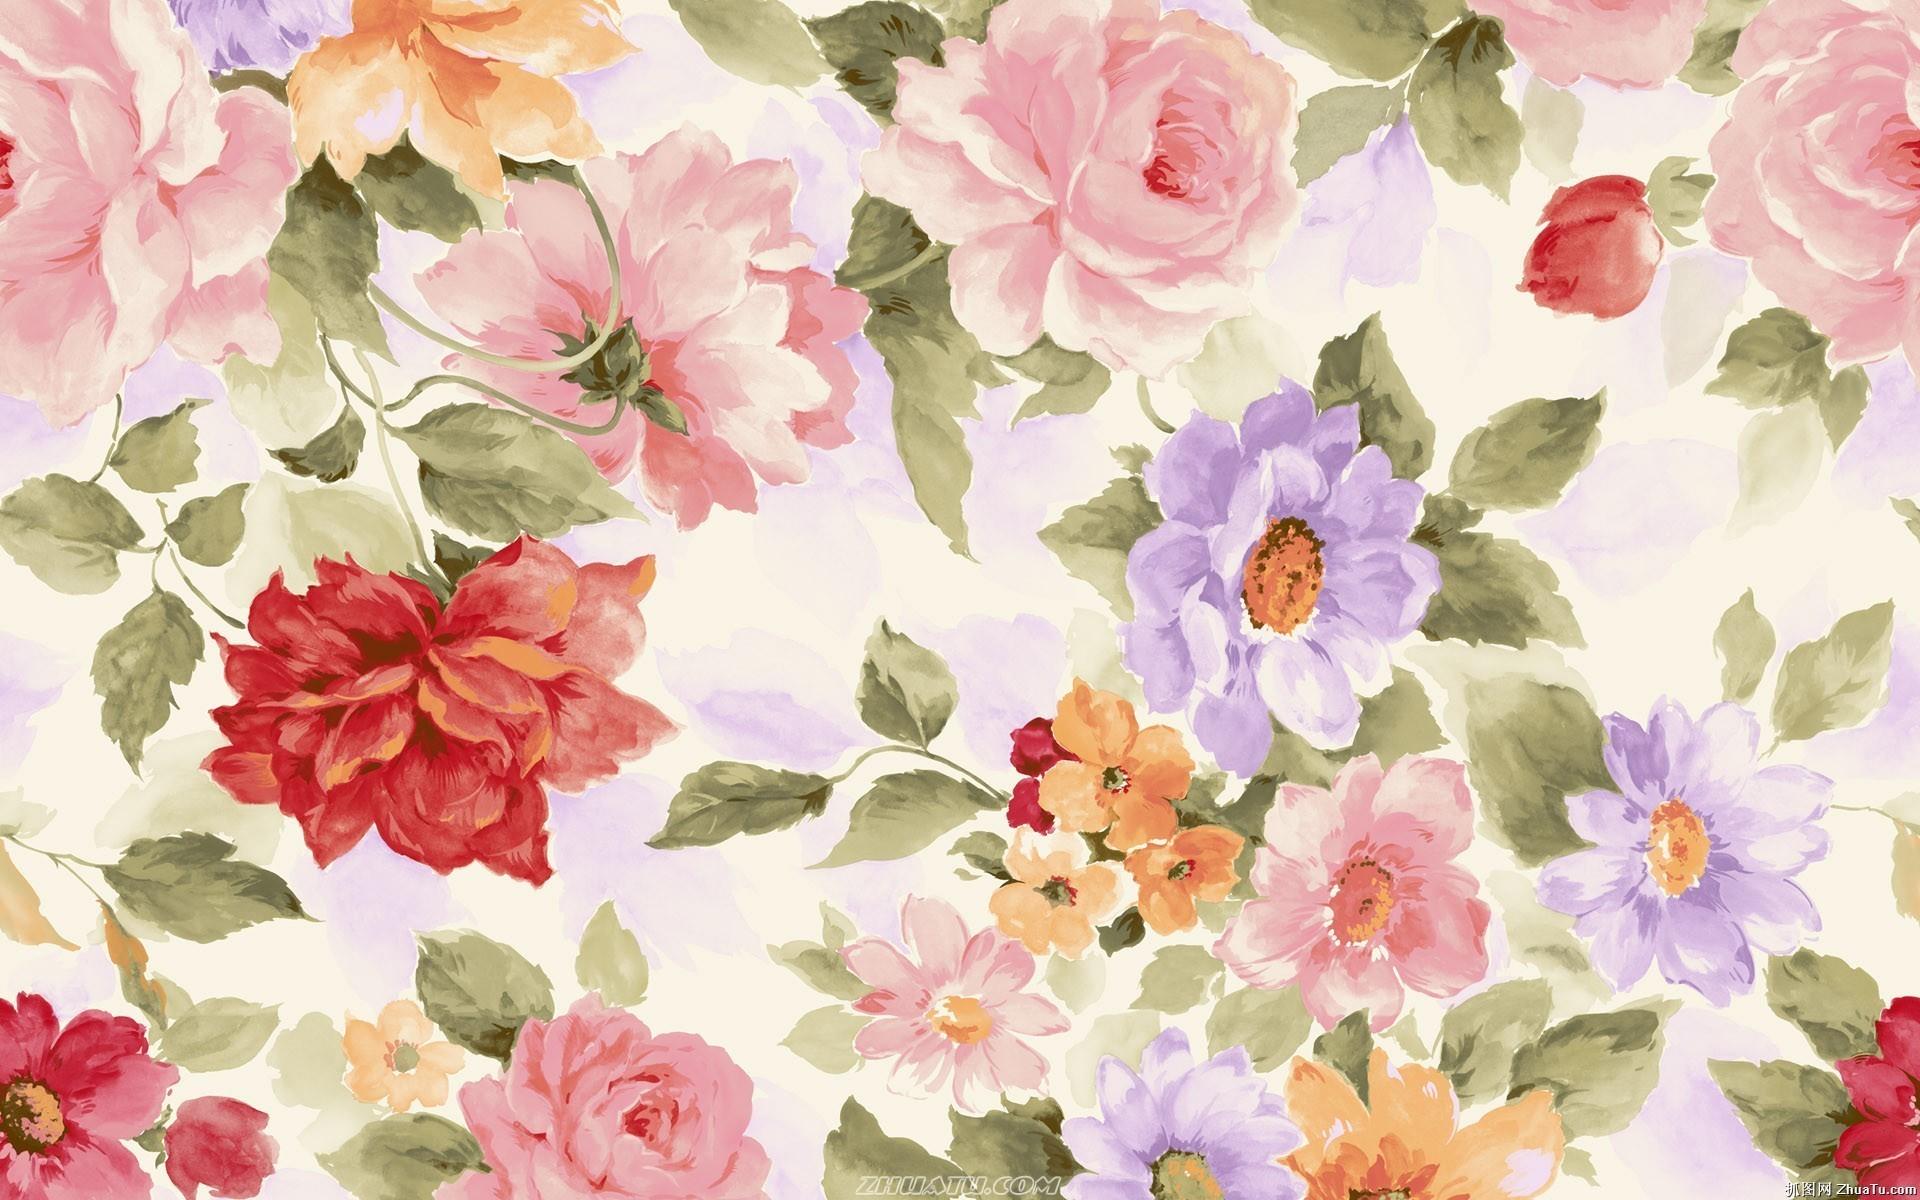 Watercolor Flower Hd Wallpaper Data Src Flower Pattern Hd Desktop 1920x1200 Download Hd Wallpaper Wallpapertip